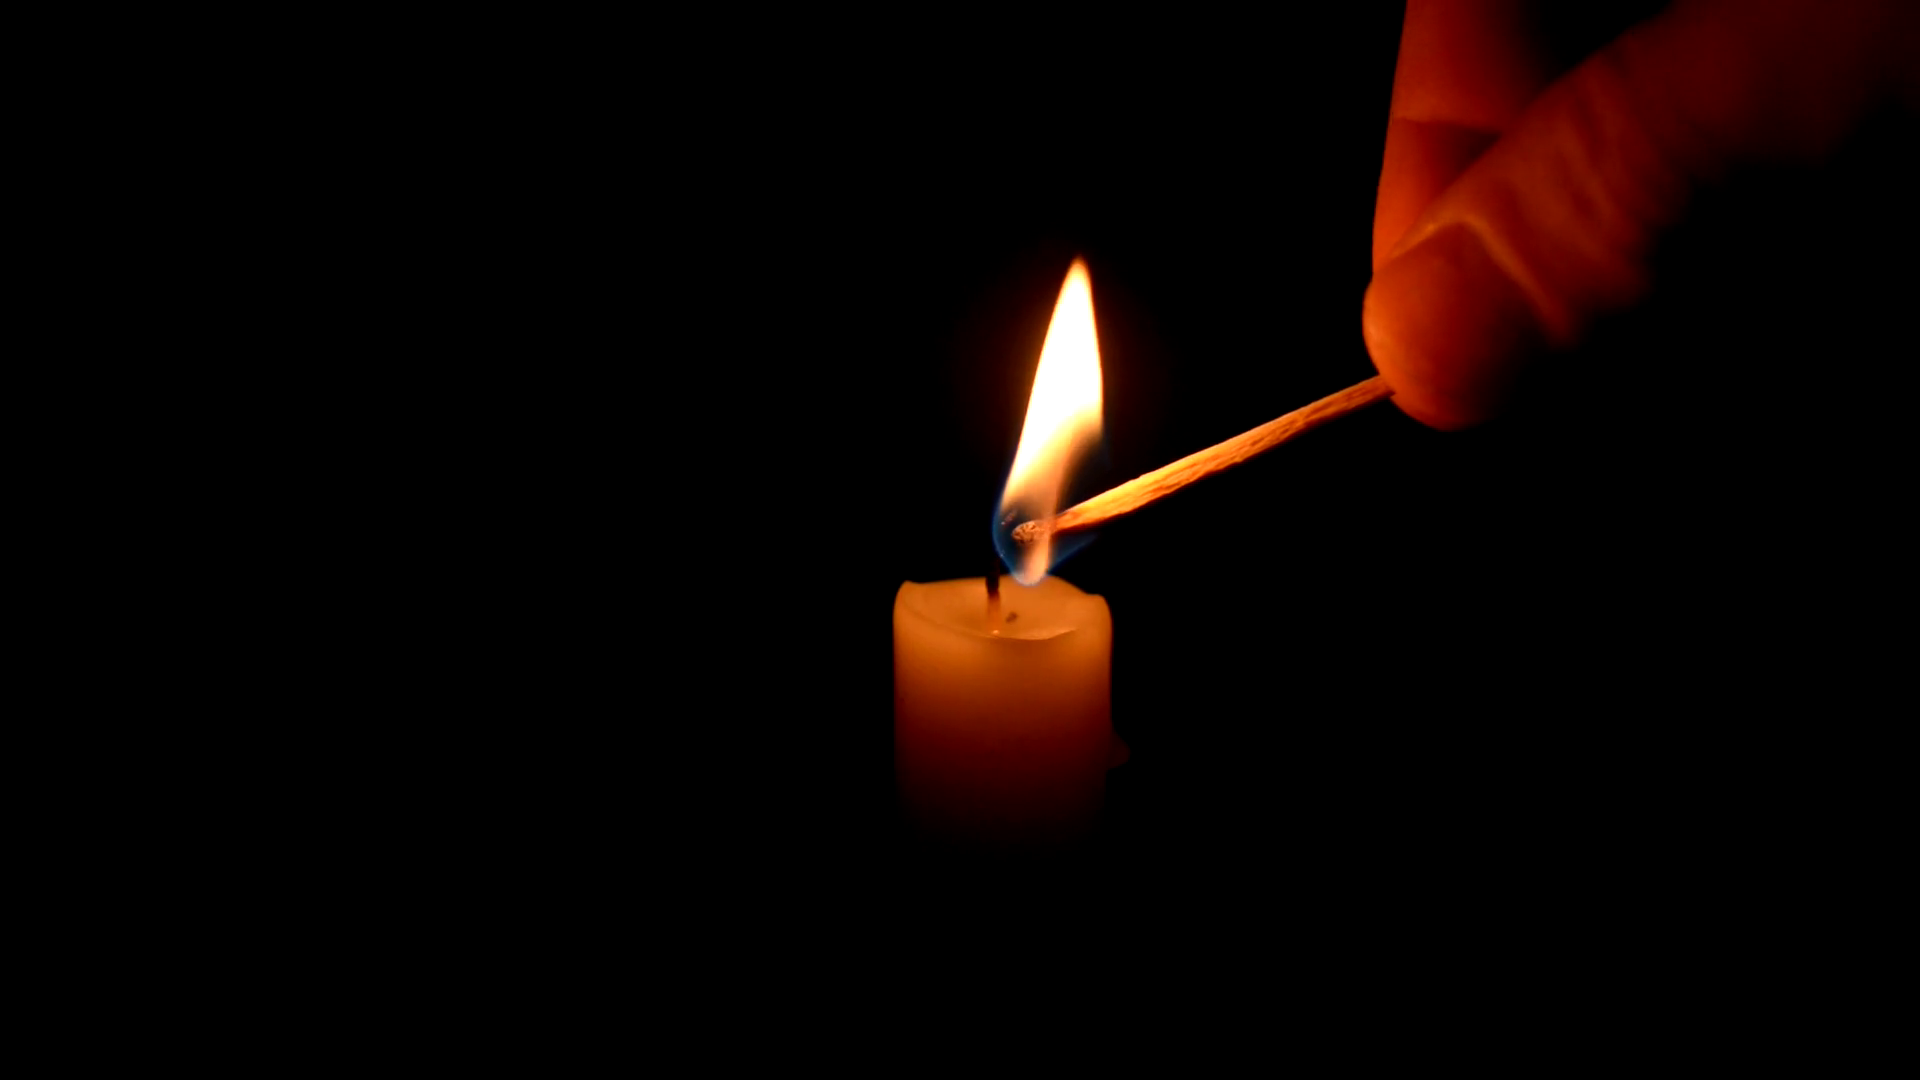 single candle burning on dark Stock Video Footage - Videoblocks